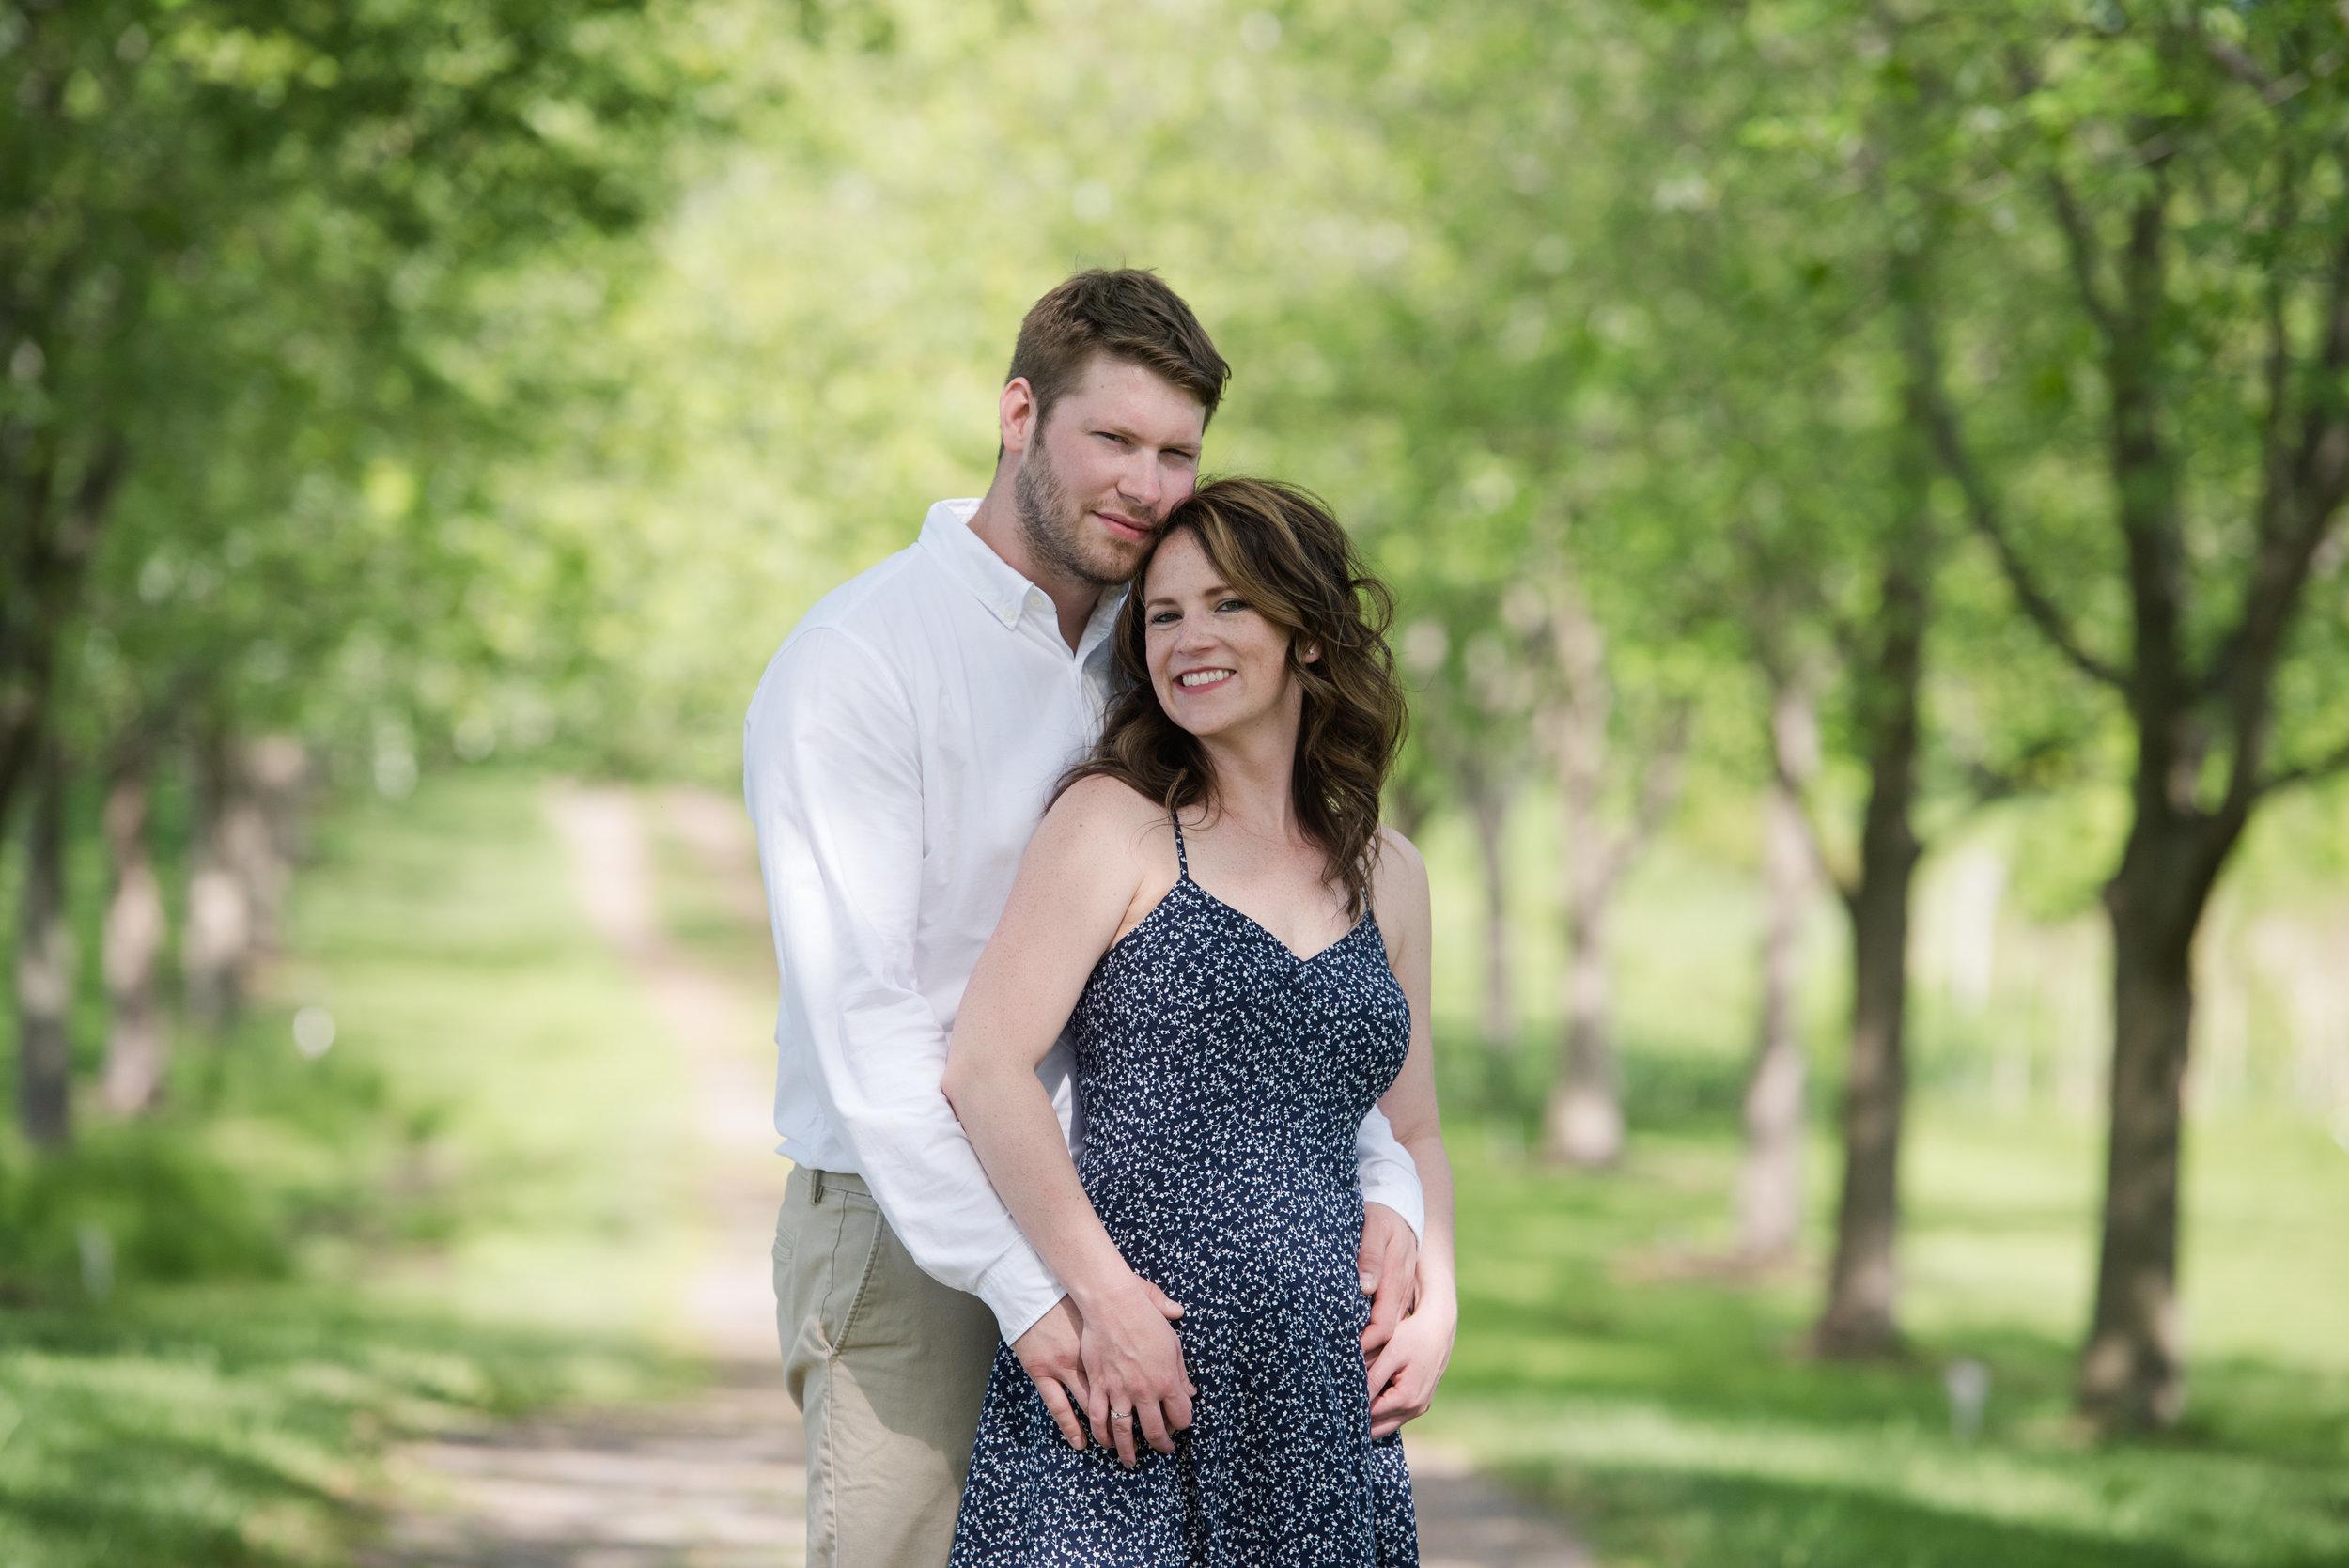 GALLERY-2019-6-9 Kaitlin, Justin & Liam Engagement 0864 129.jpg